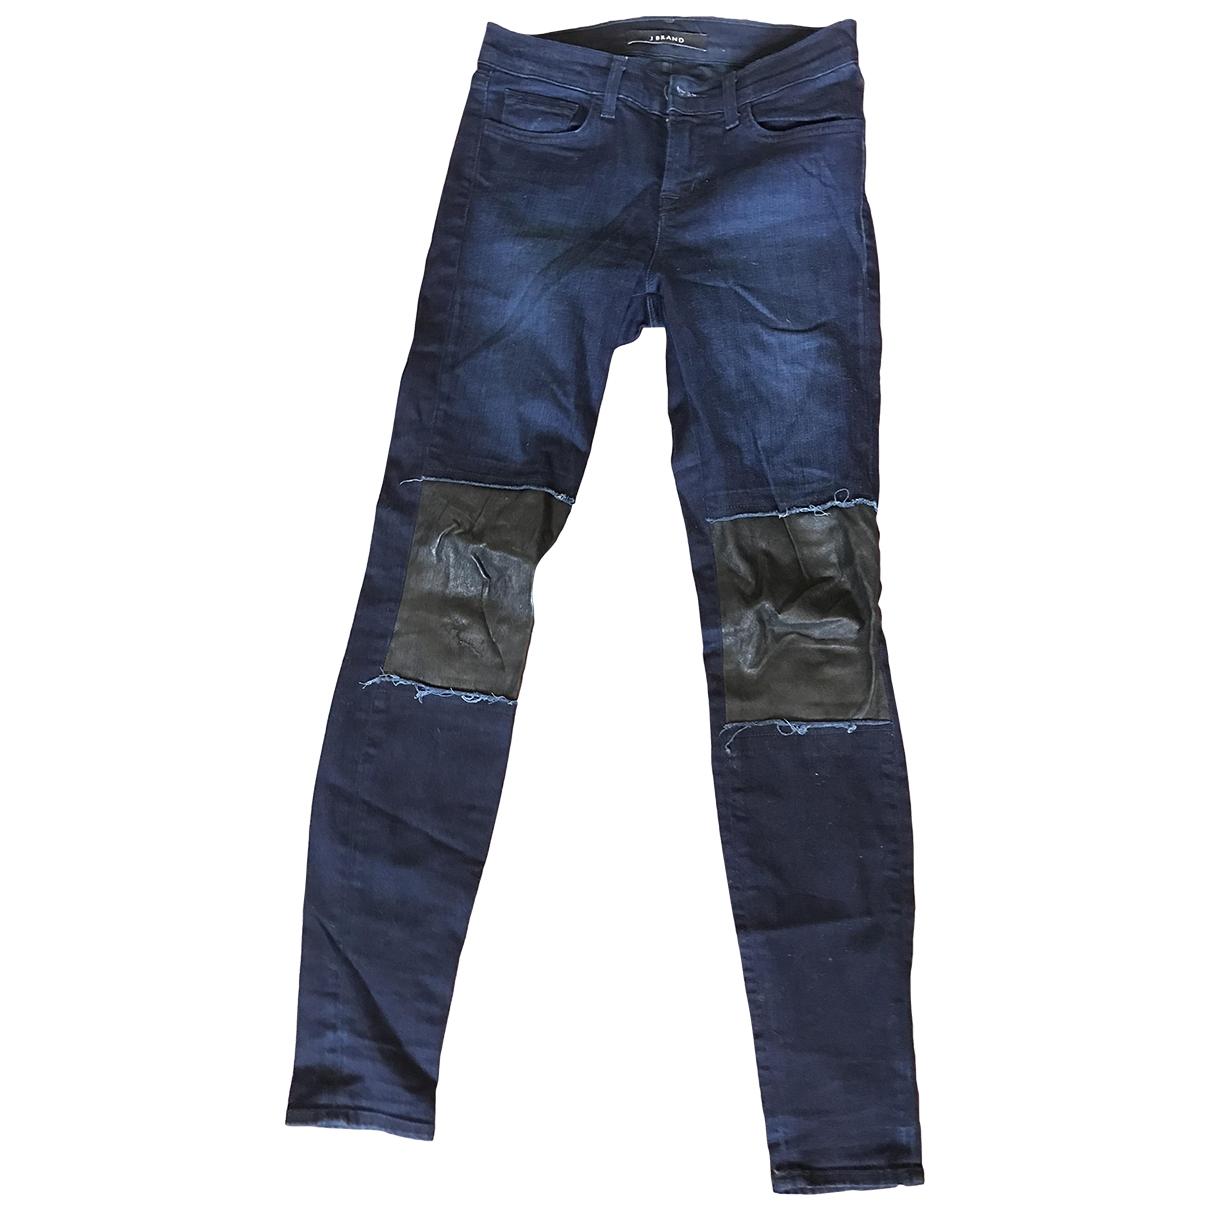 J Brand \N Jeans in  Marine Denim - Jeans